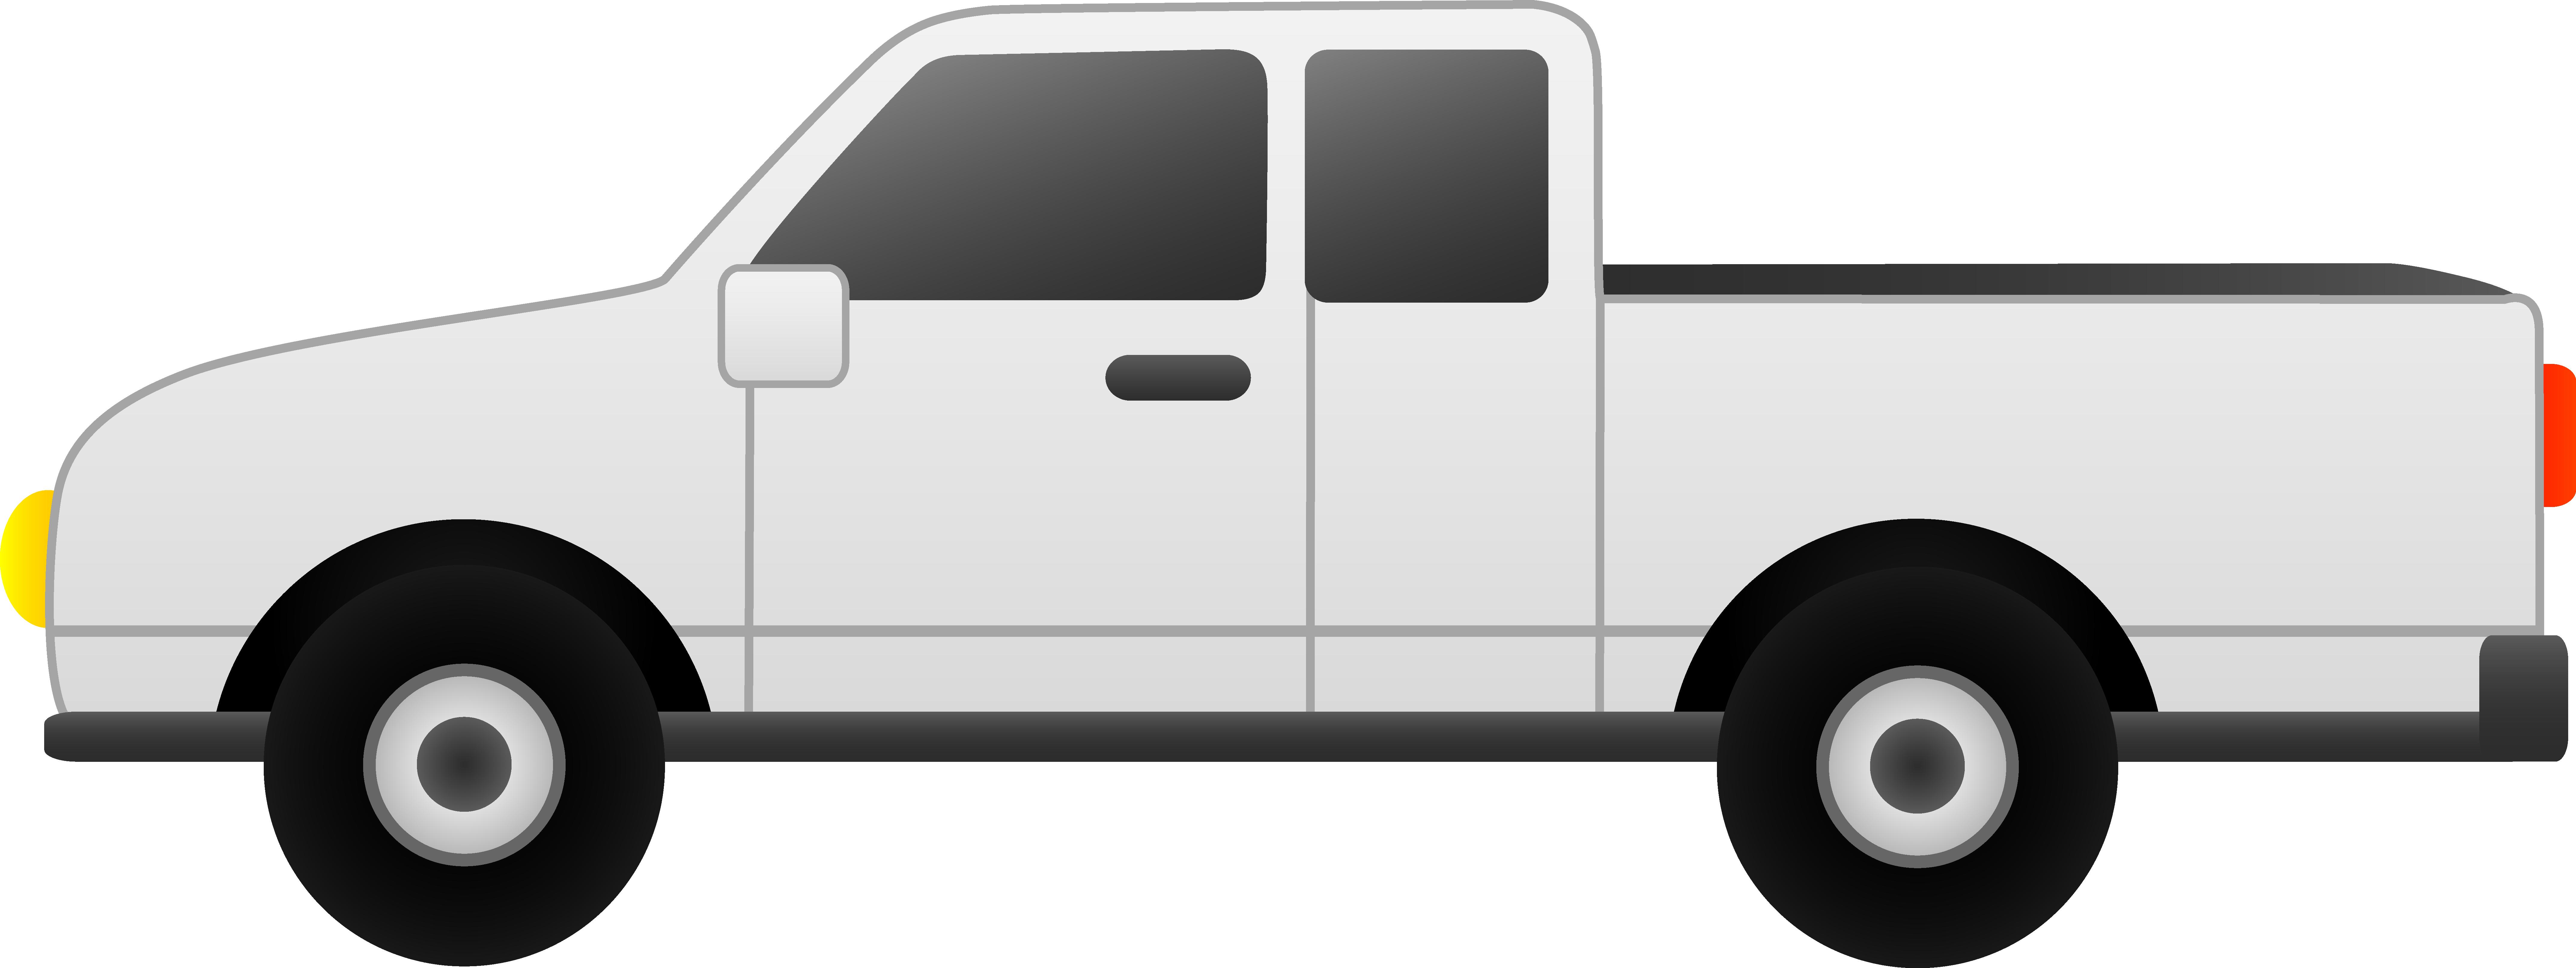 Pickup Truck Clipart.